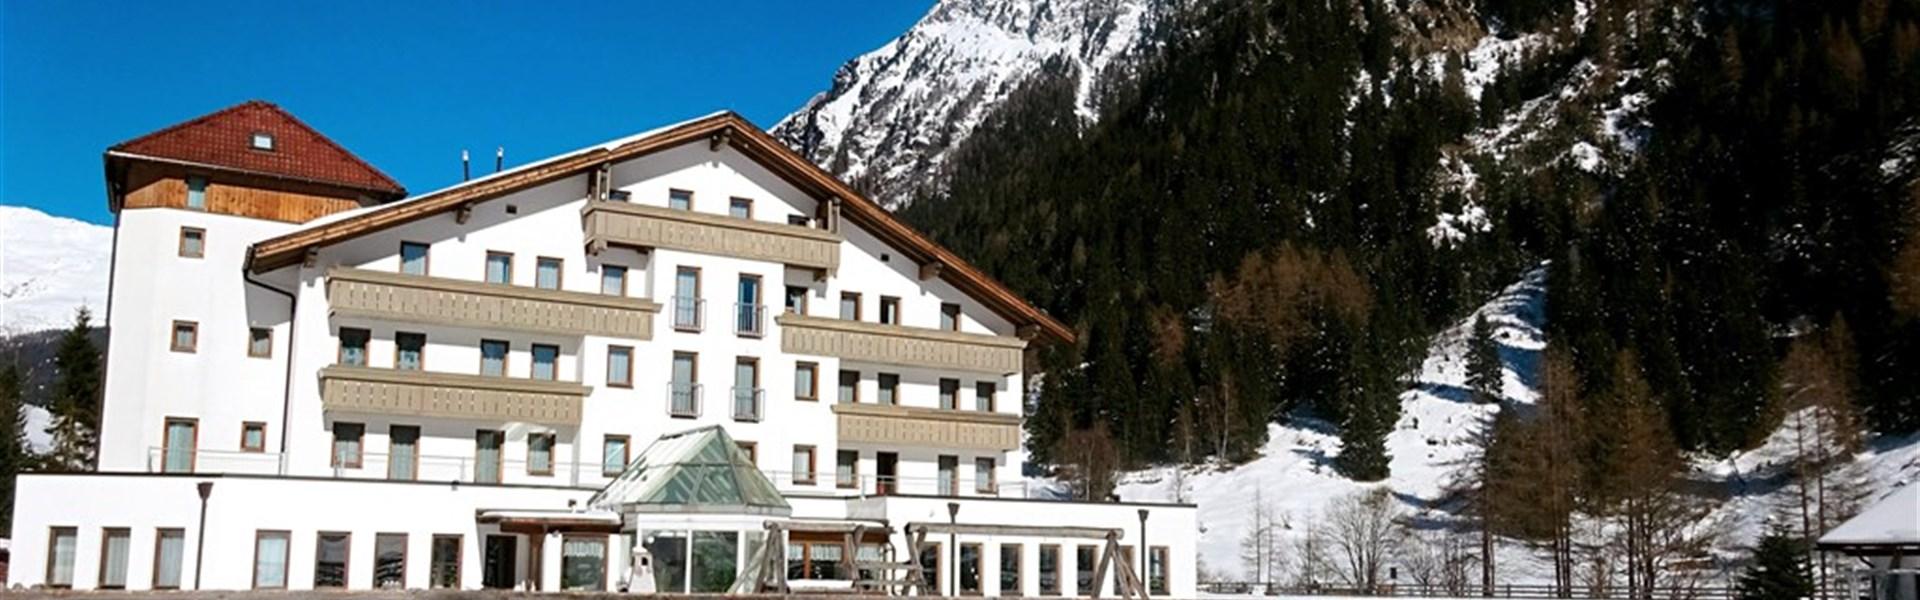 Marco Polo - Hotel Tia Monte W22 -